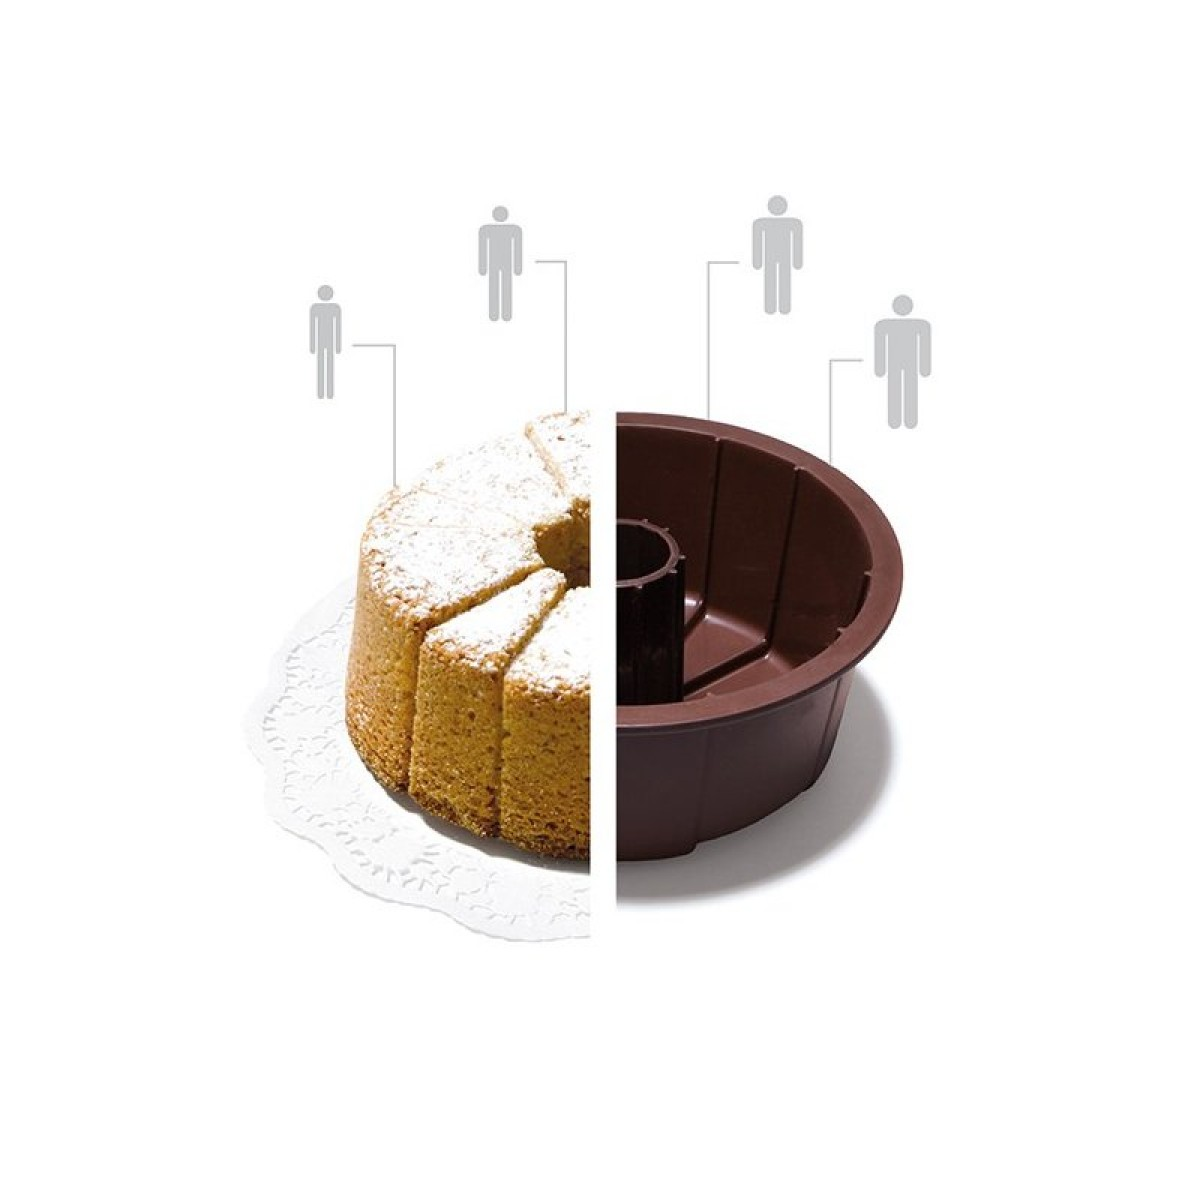 Konstantin Slawinski S-XL CAKE SMALL Backform